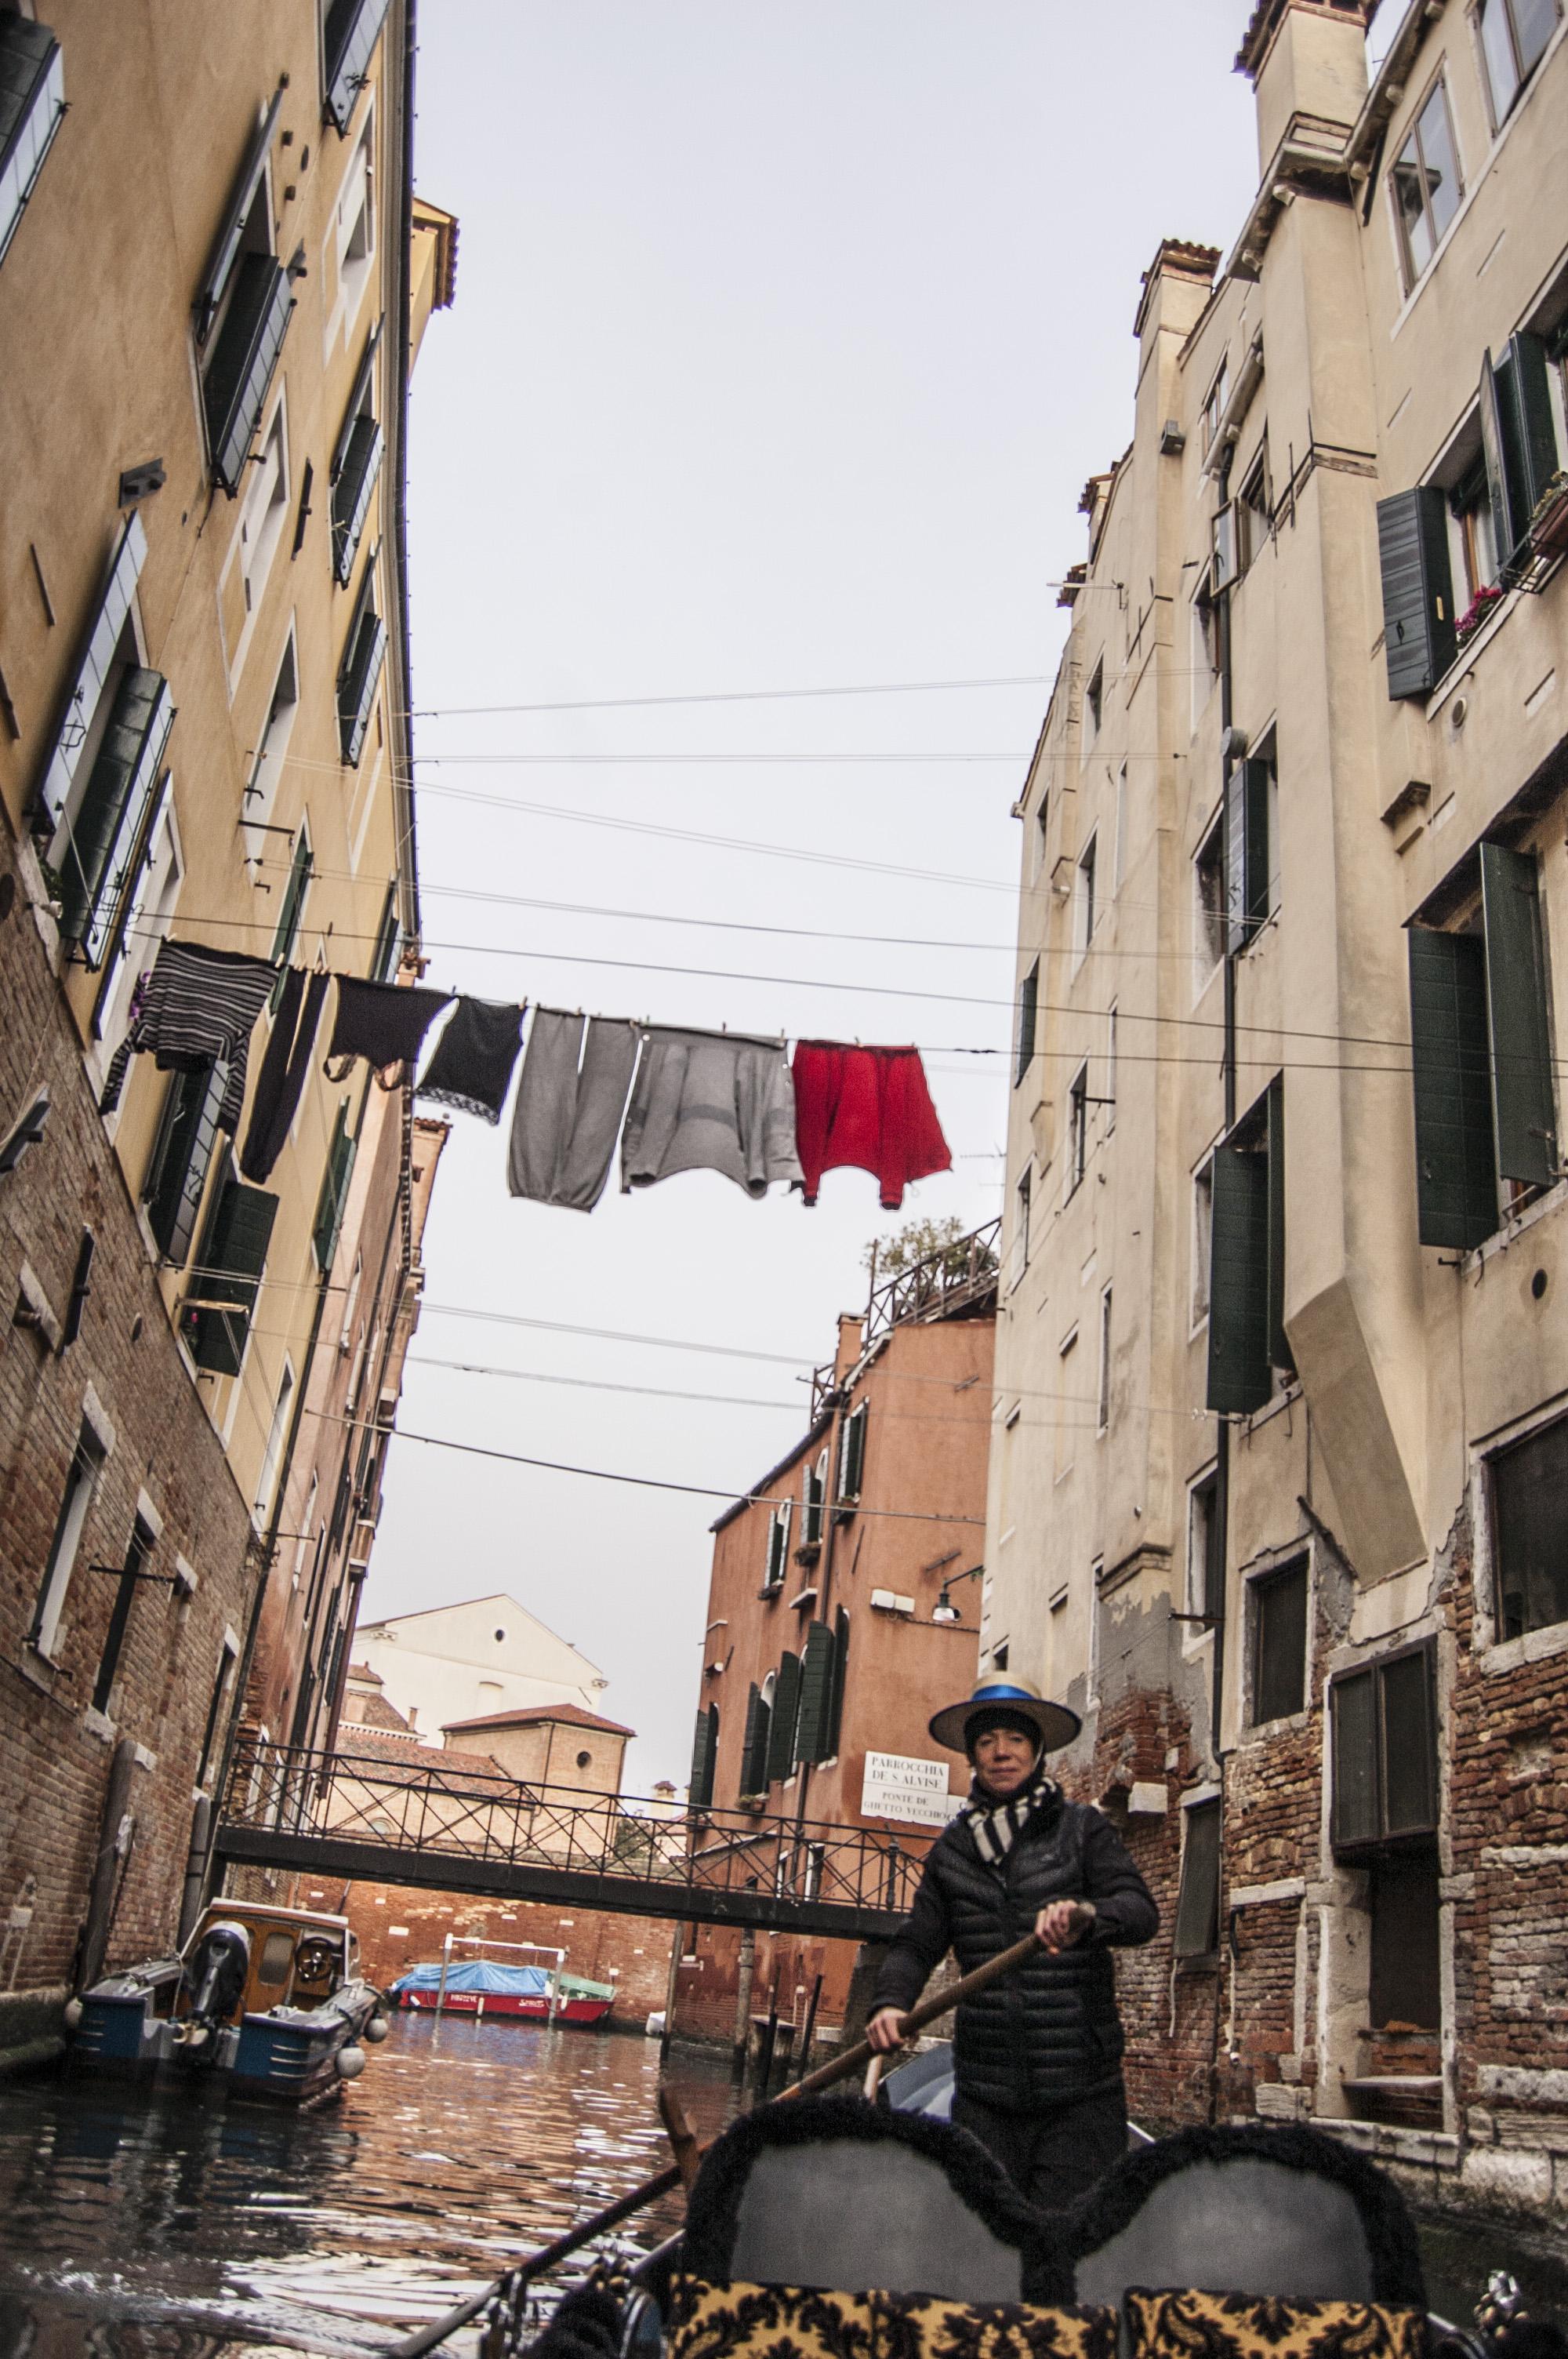 Storiedichi_Gondola_Tour_Venezia_wm